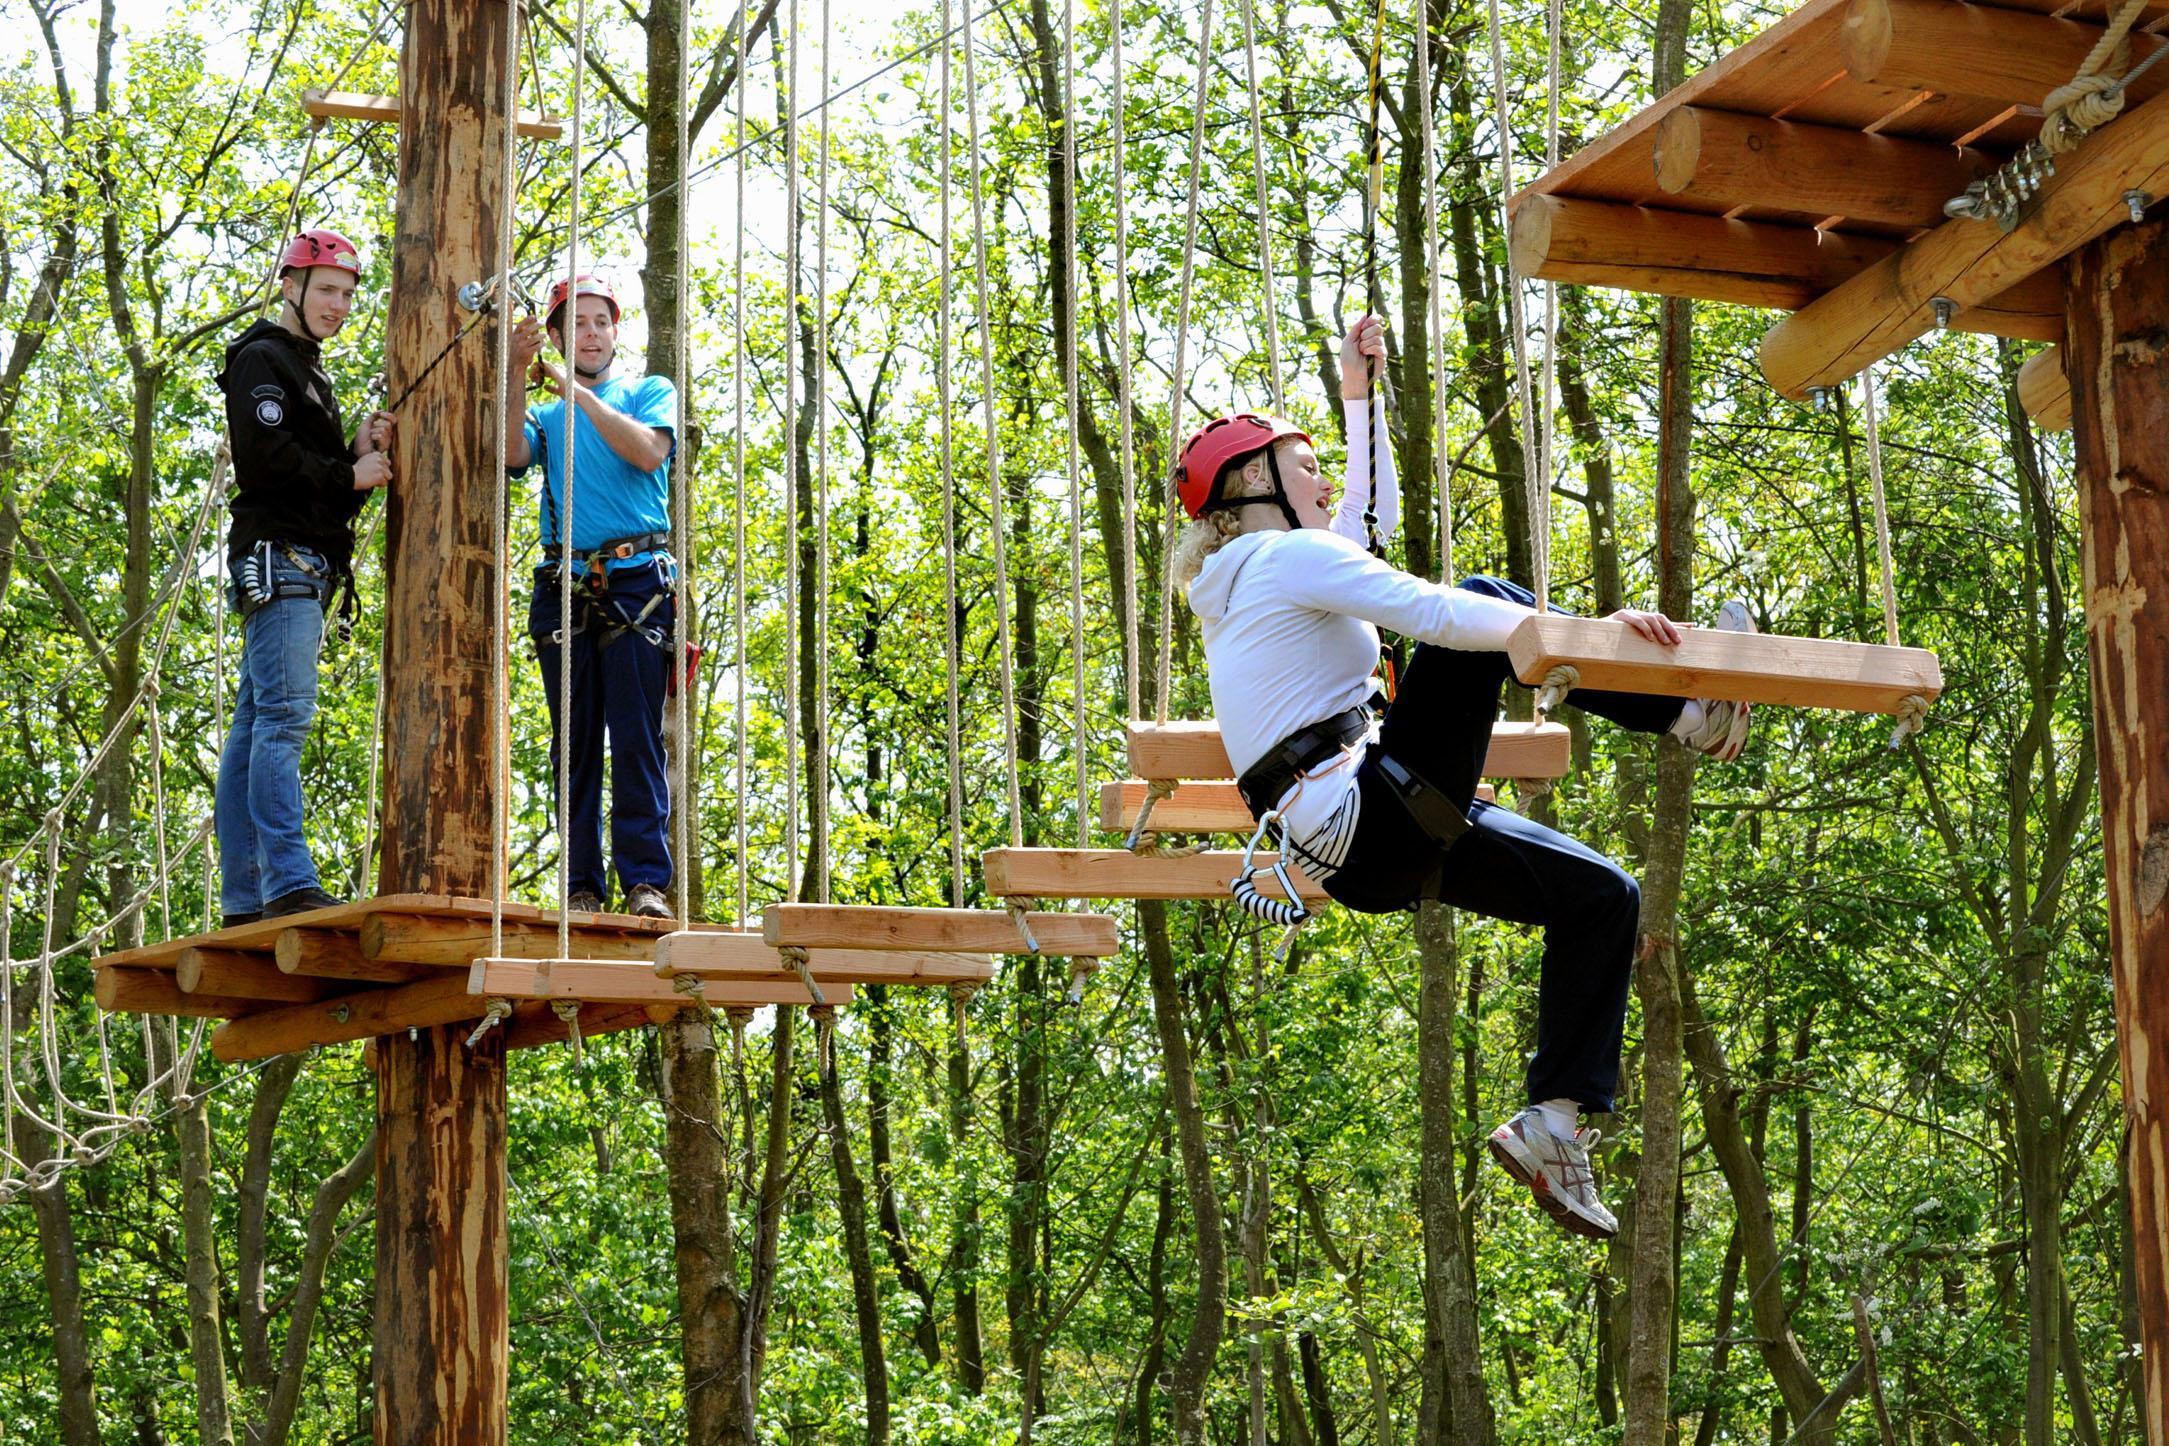 Klimpark in Park21 deze zomer al geopend